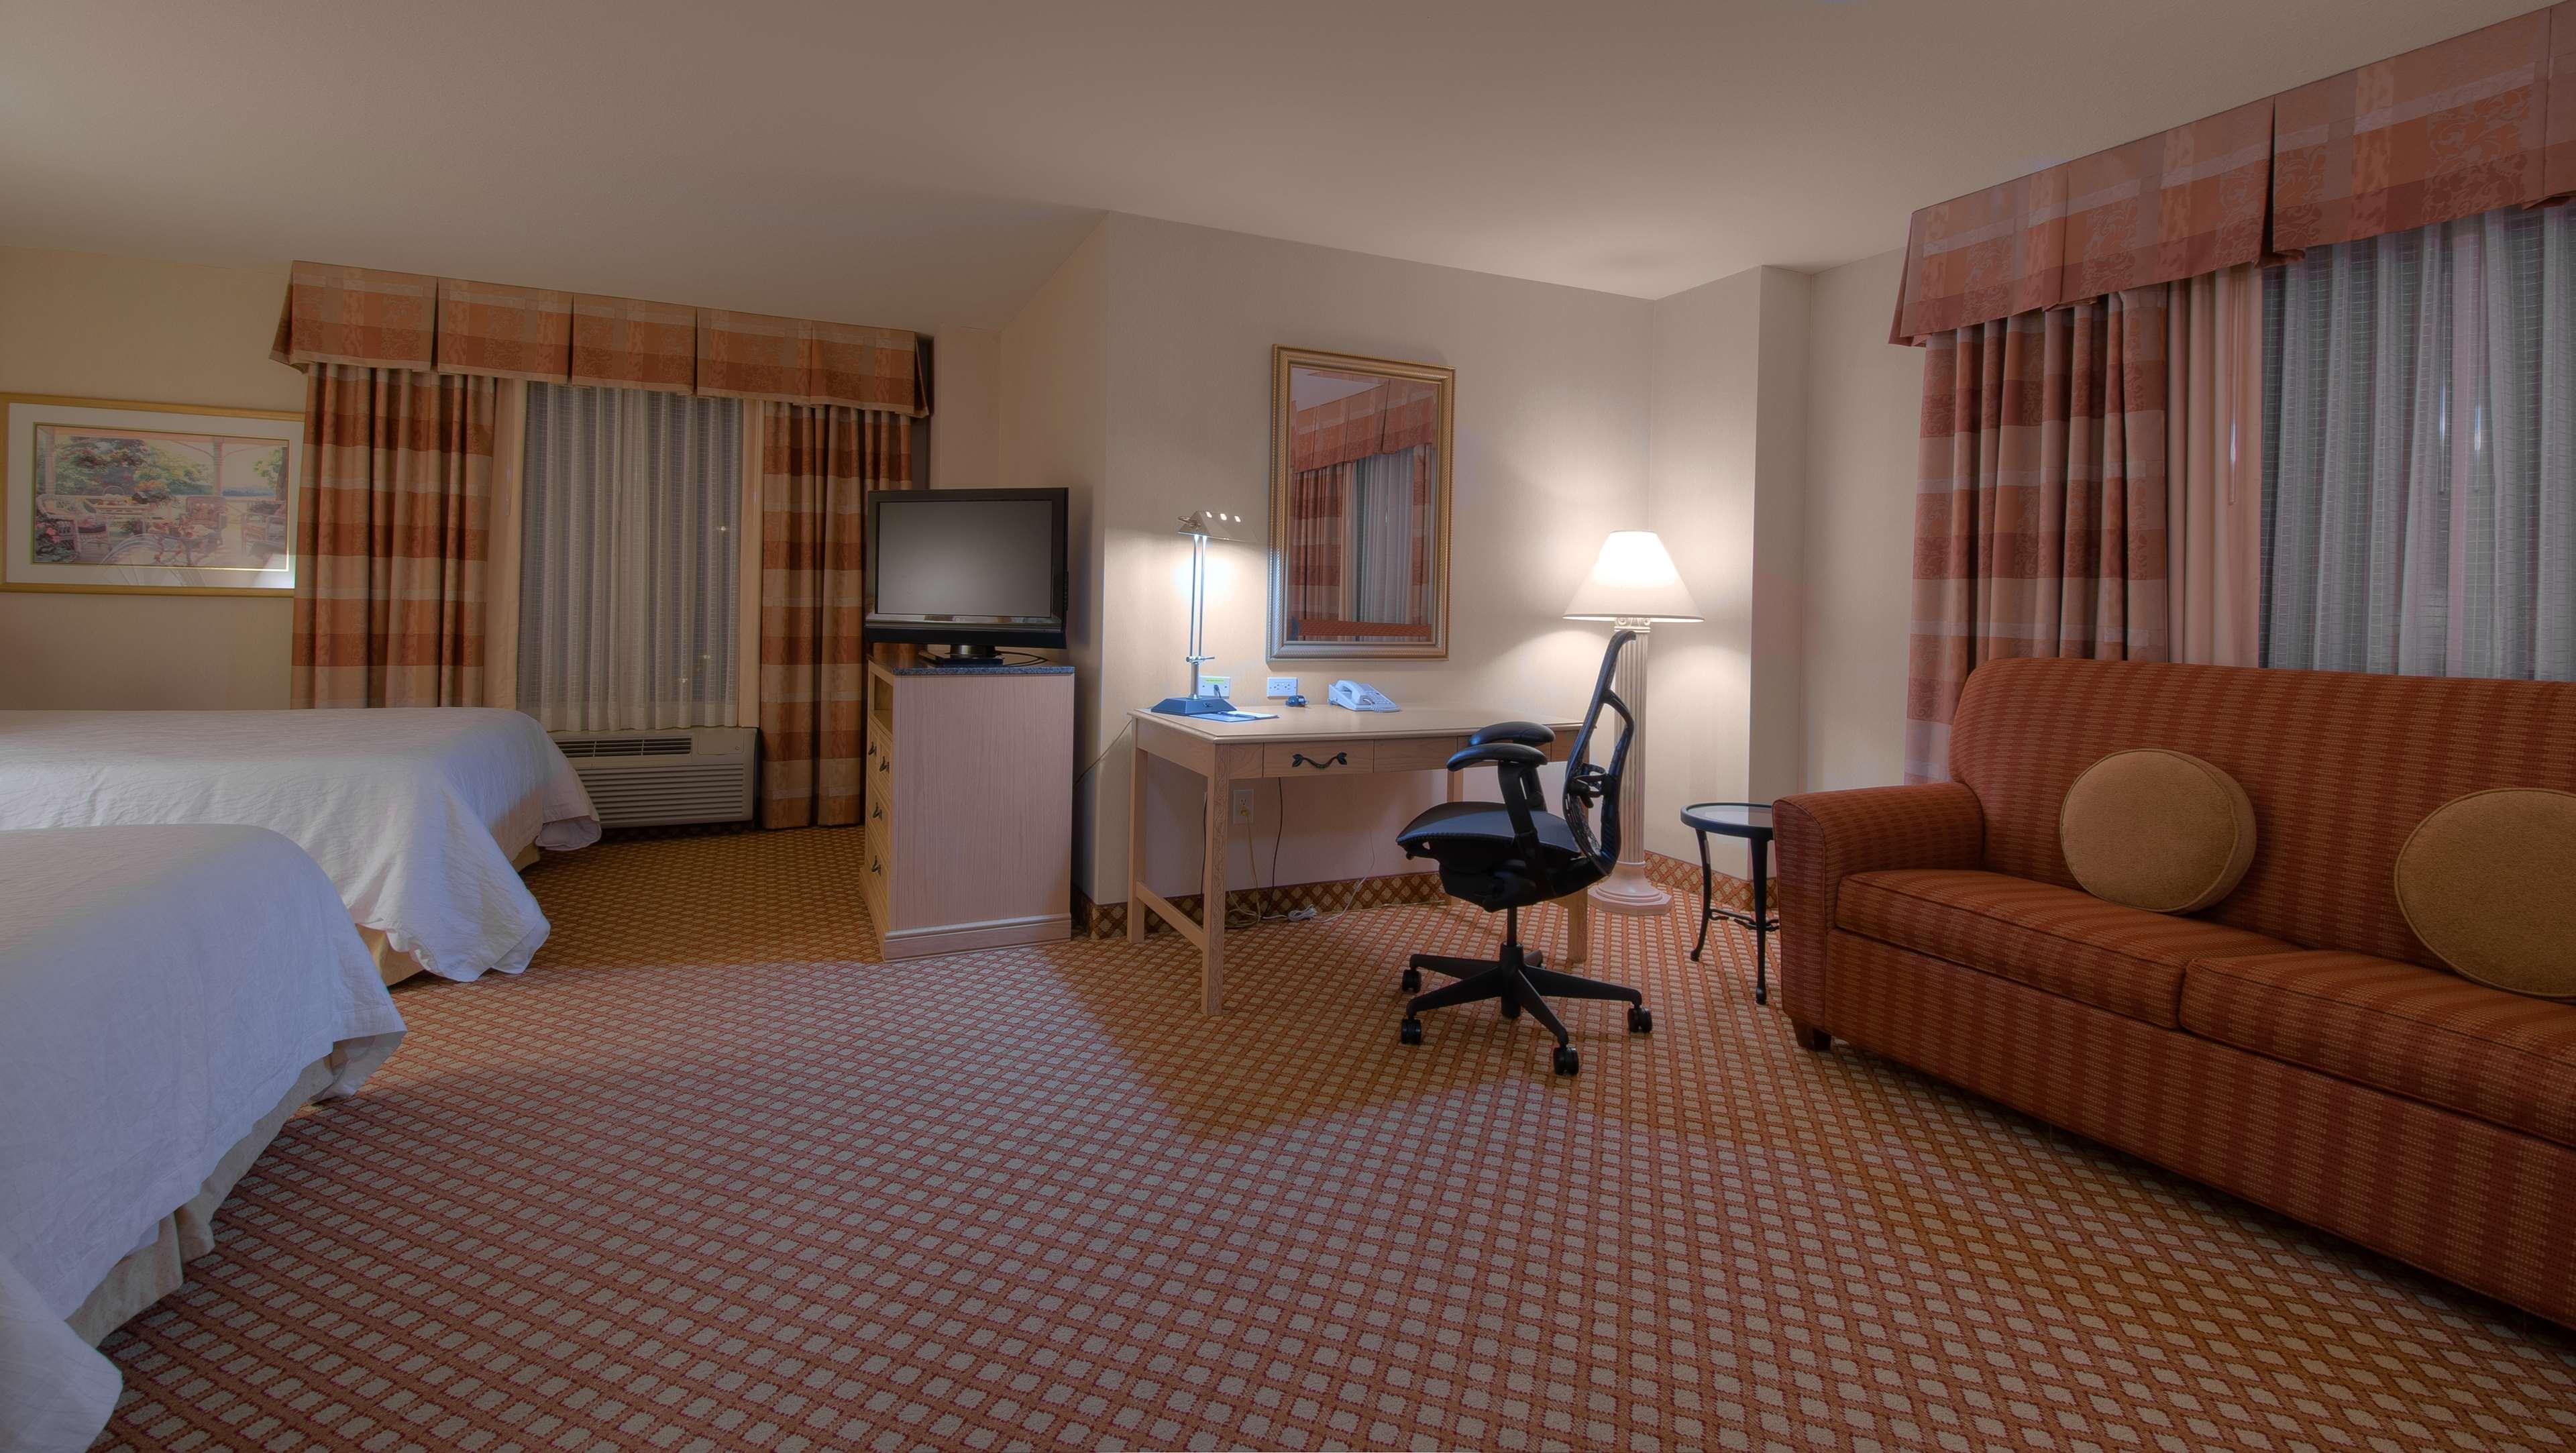 Hilton Garden Inn Mountain View image 3